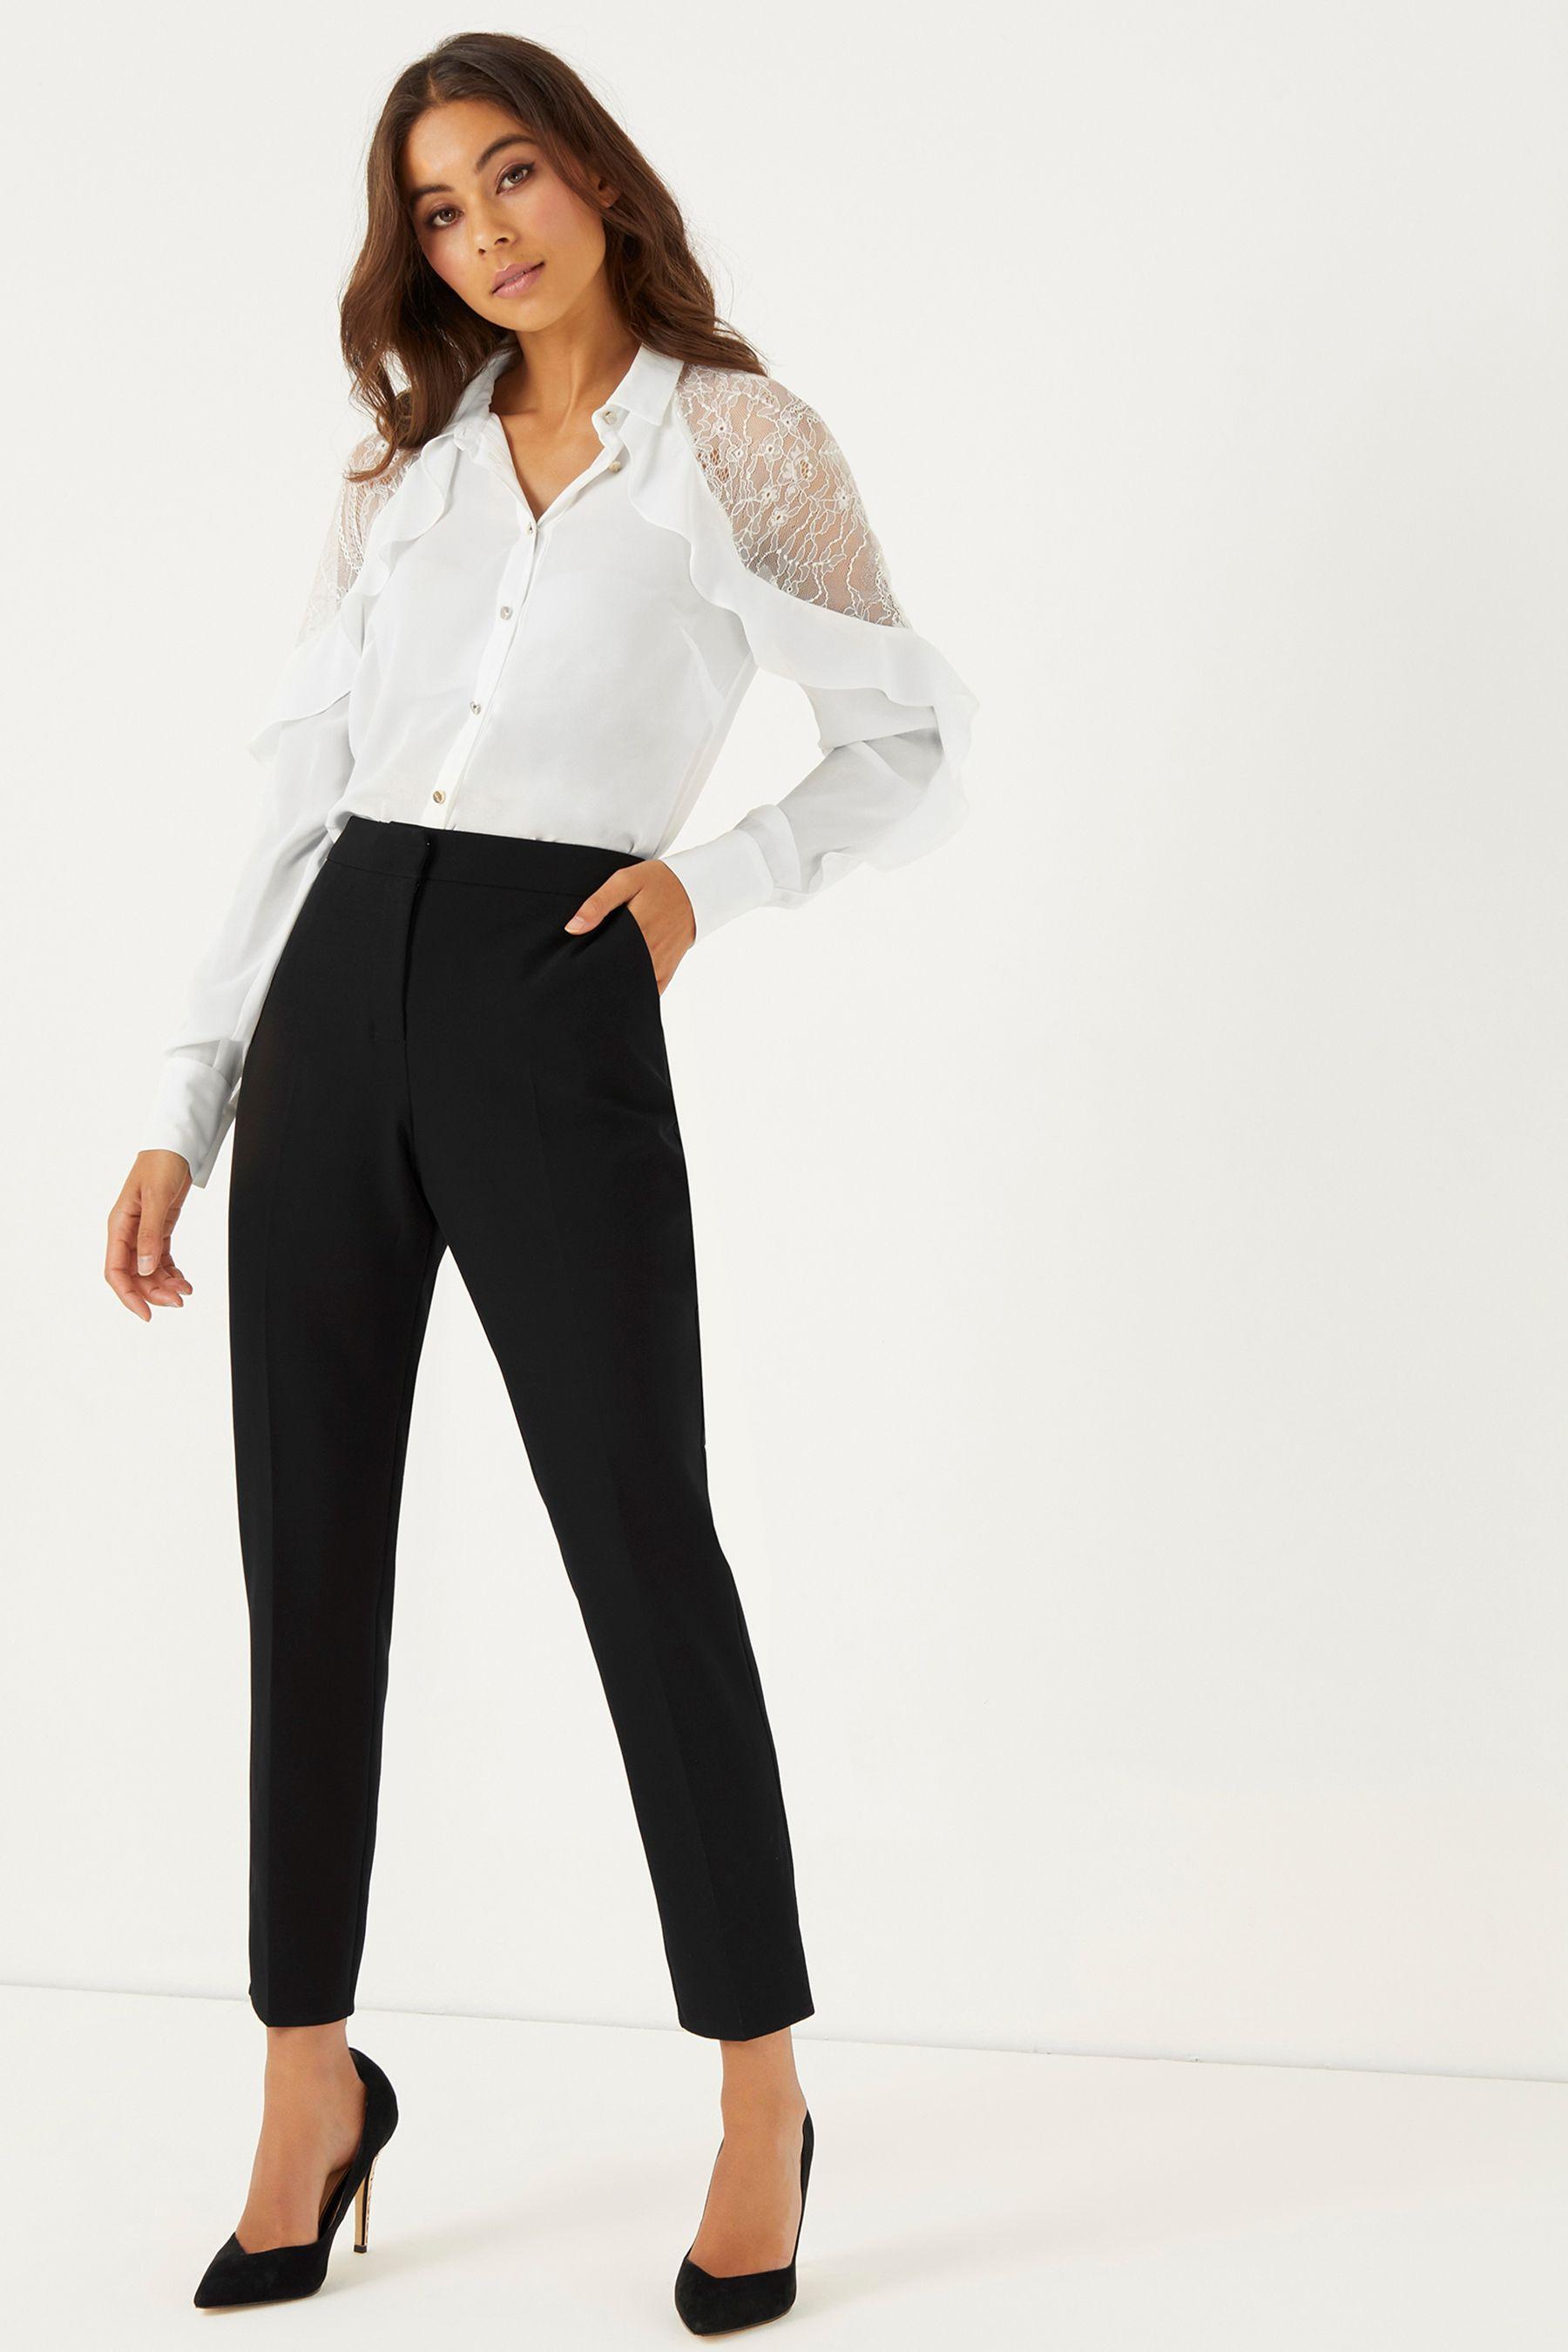 5a6e9c115ad7 Womens Lipsy Lace Shoulder Shirt - White